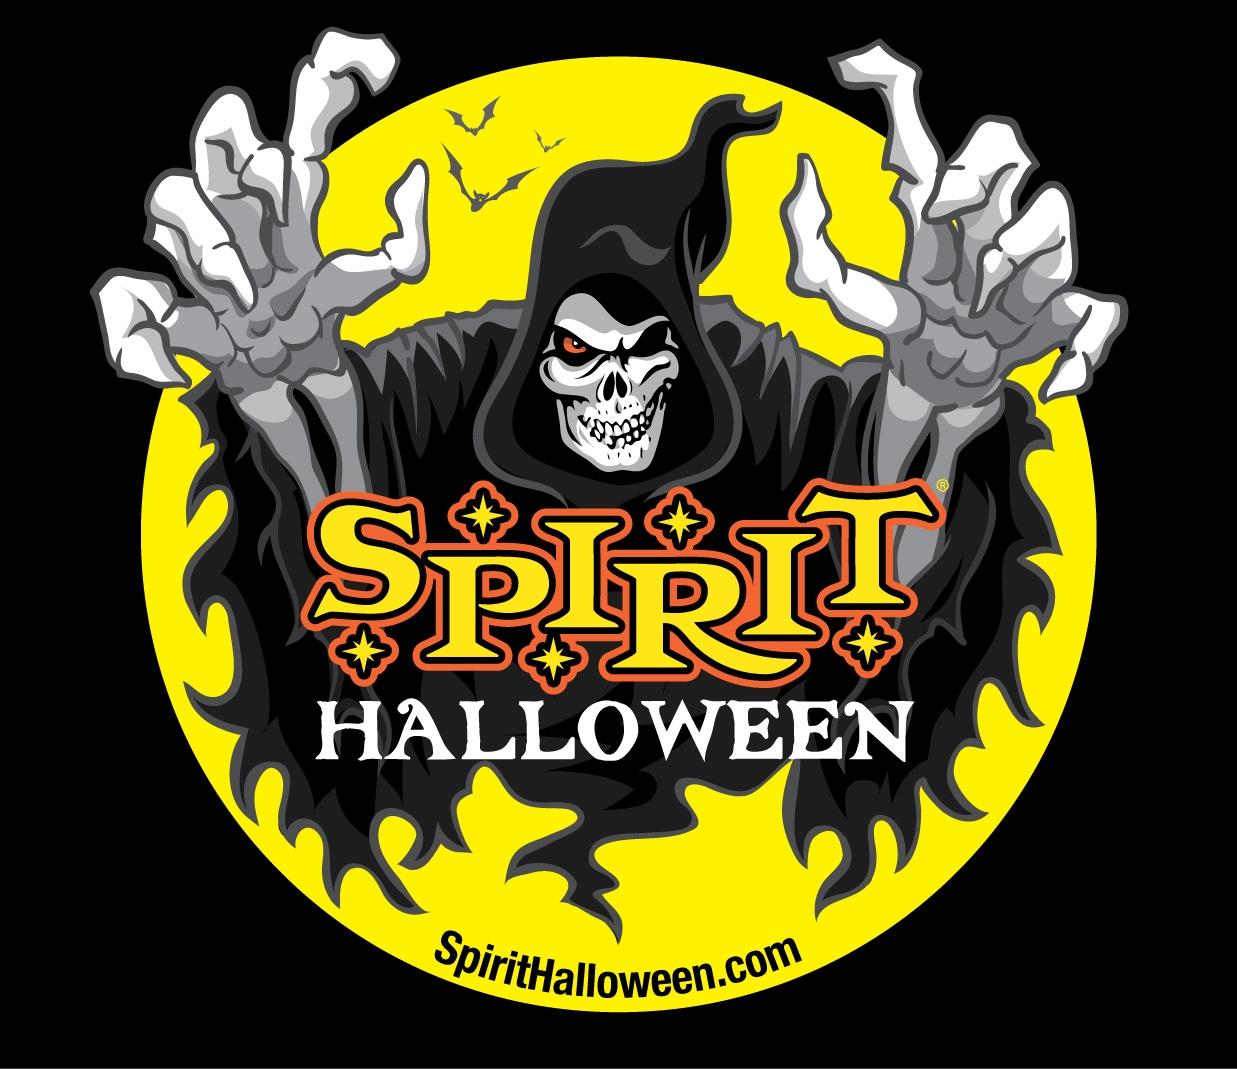 spirit halloween - Halloween Stores In Fayetteville Ar